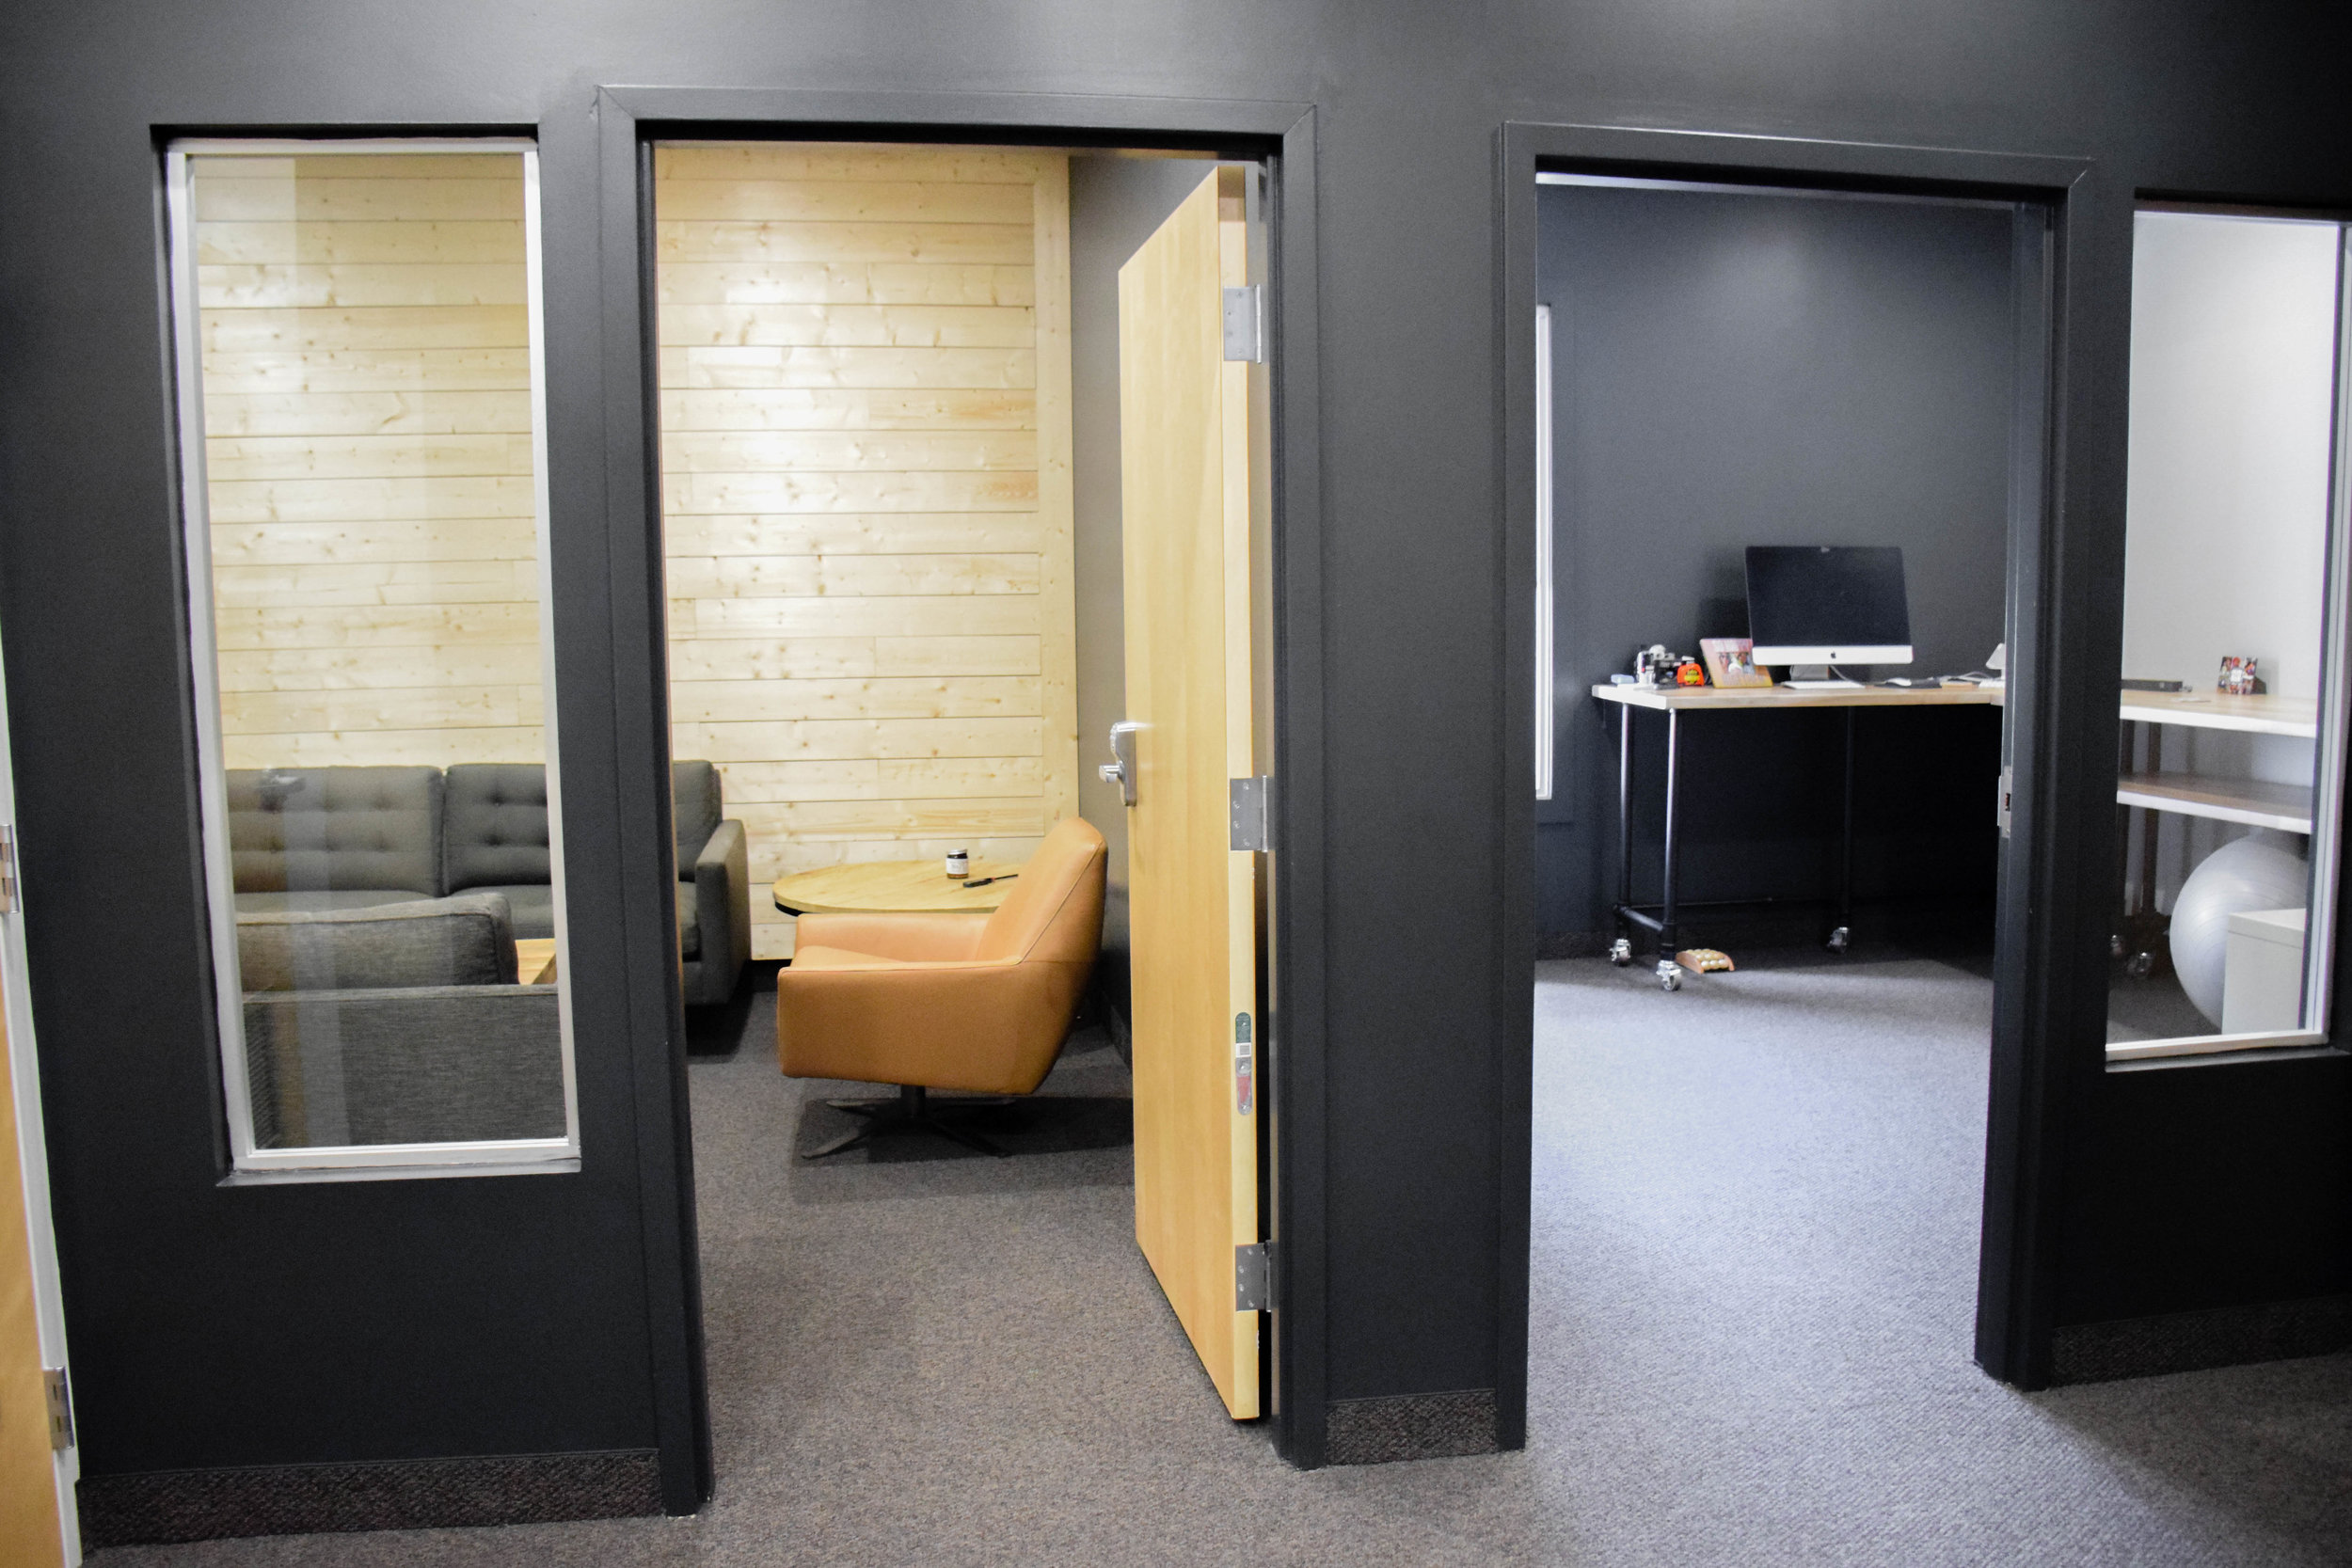 industrial workspace design | pelaia media group-0739-2.jpg